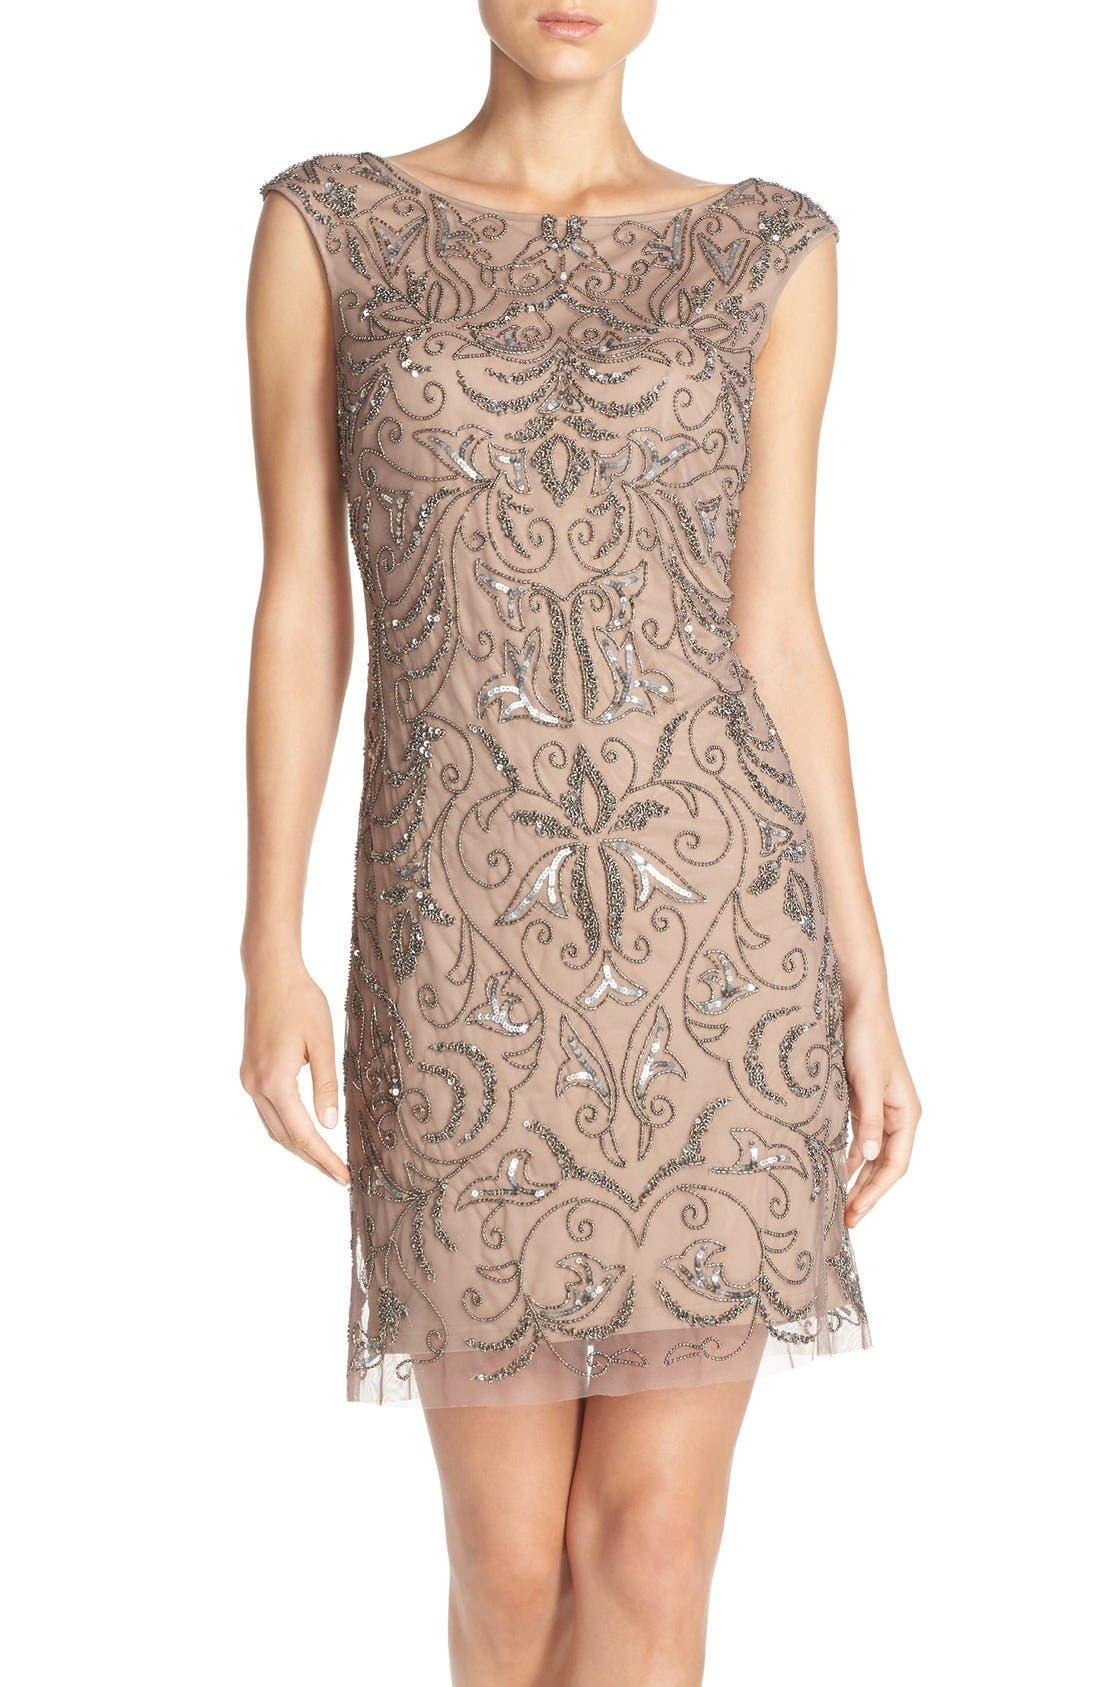 Alternate Image 1 Selected - Adrianna Papell Beaded Mesh Dress (Regular & Petite)